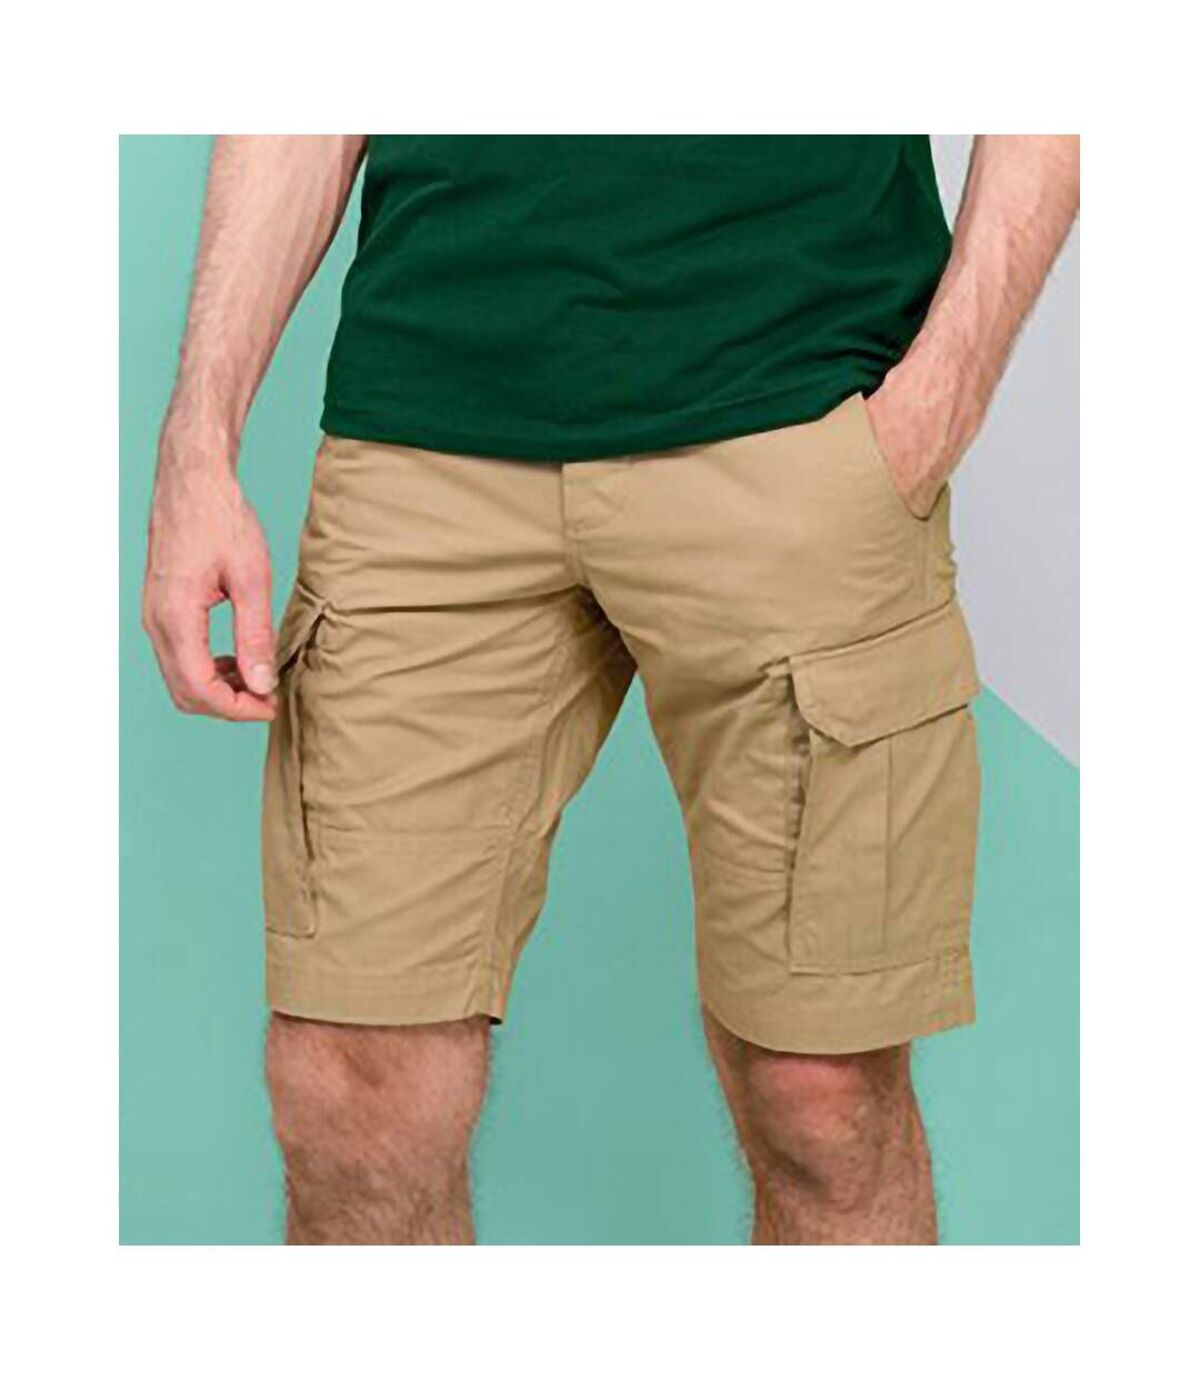 SOLS Mens Jackson Bermuda Shorts (Chestnut) - UTPC2824